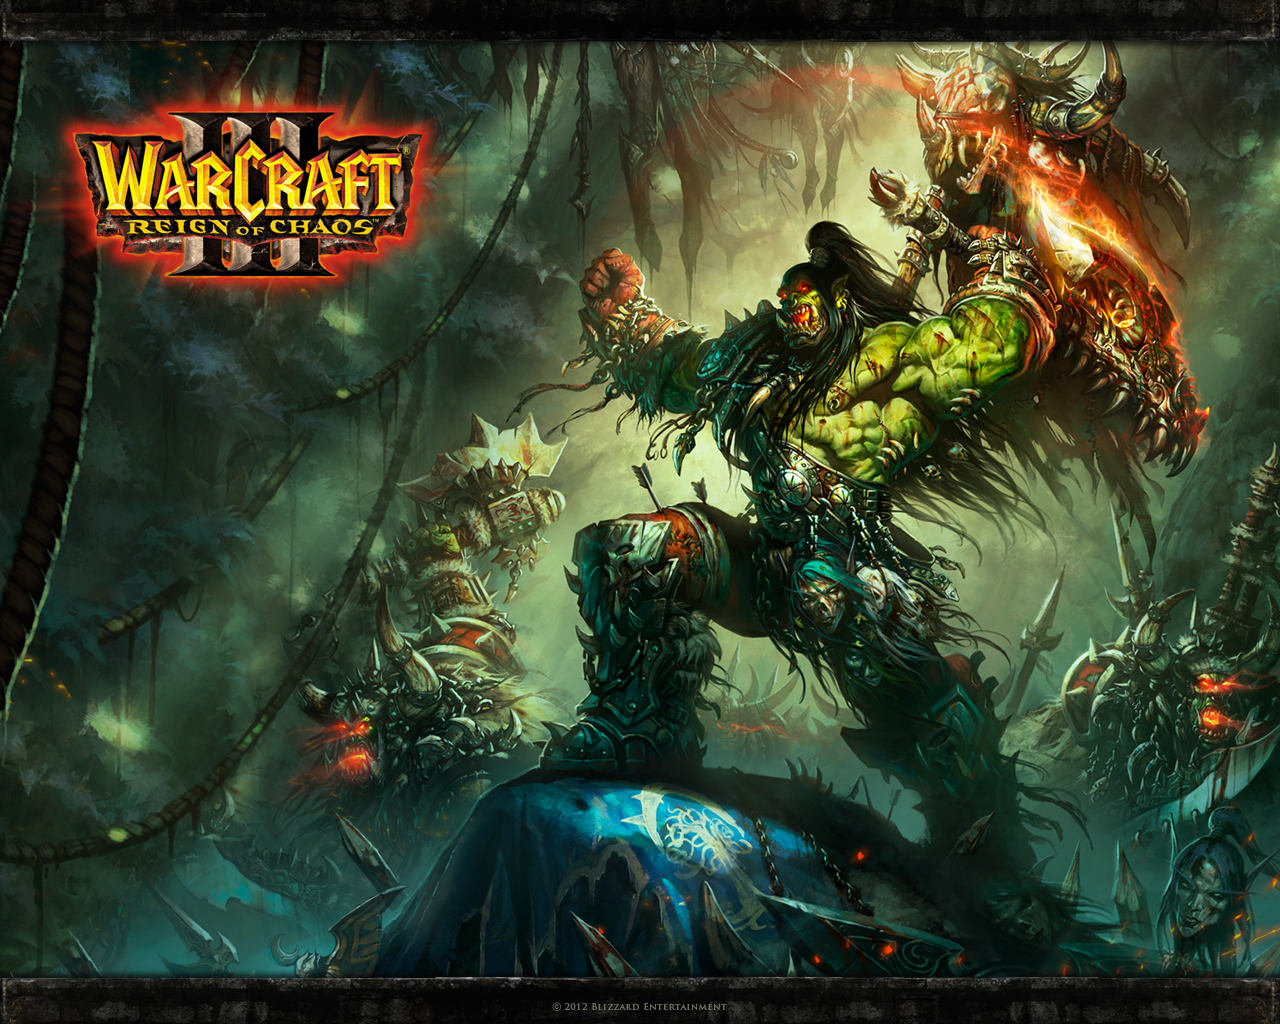 world of warcraft wallpaper 1280x1024 - photo #34